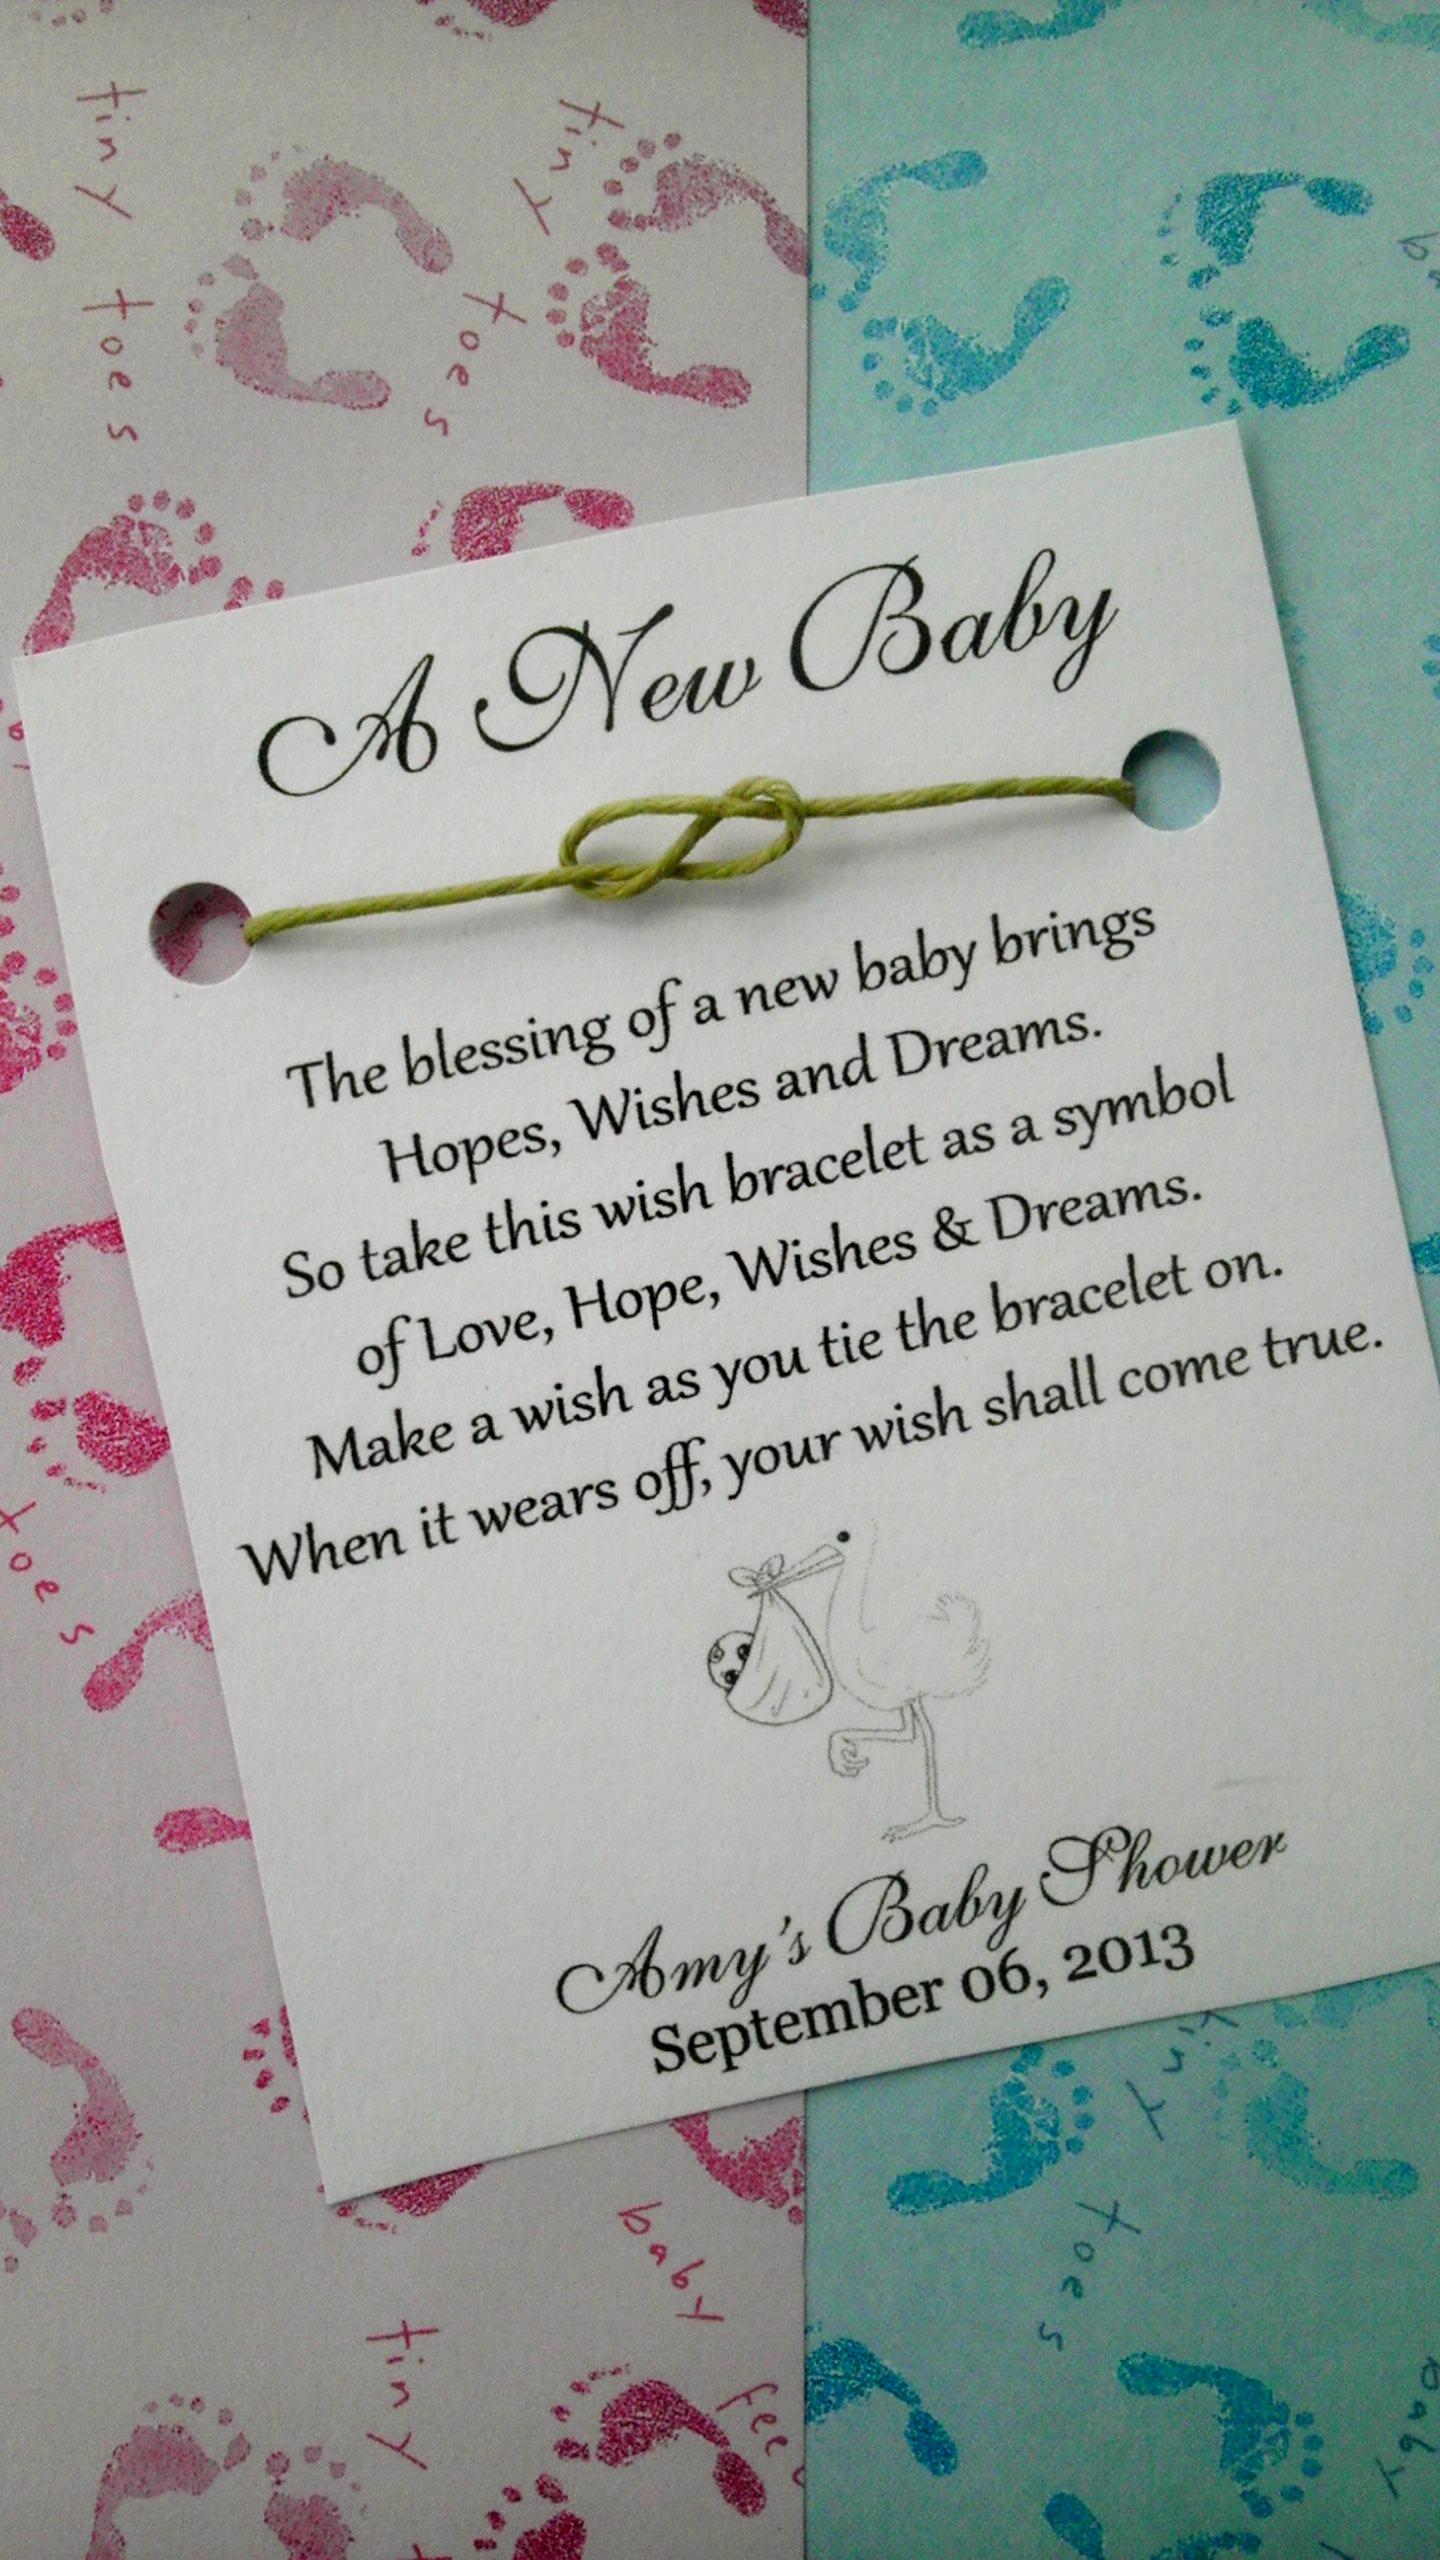 Abc baby Poems Poems